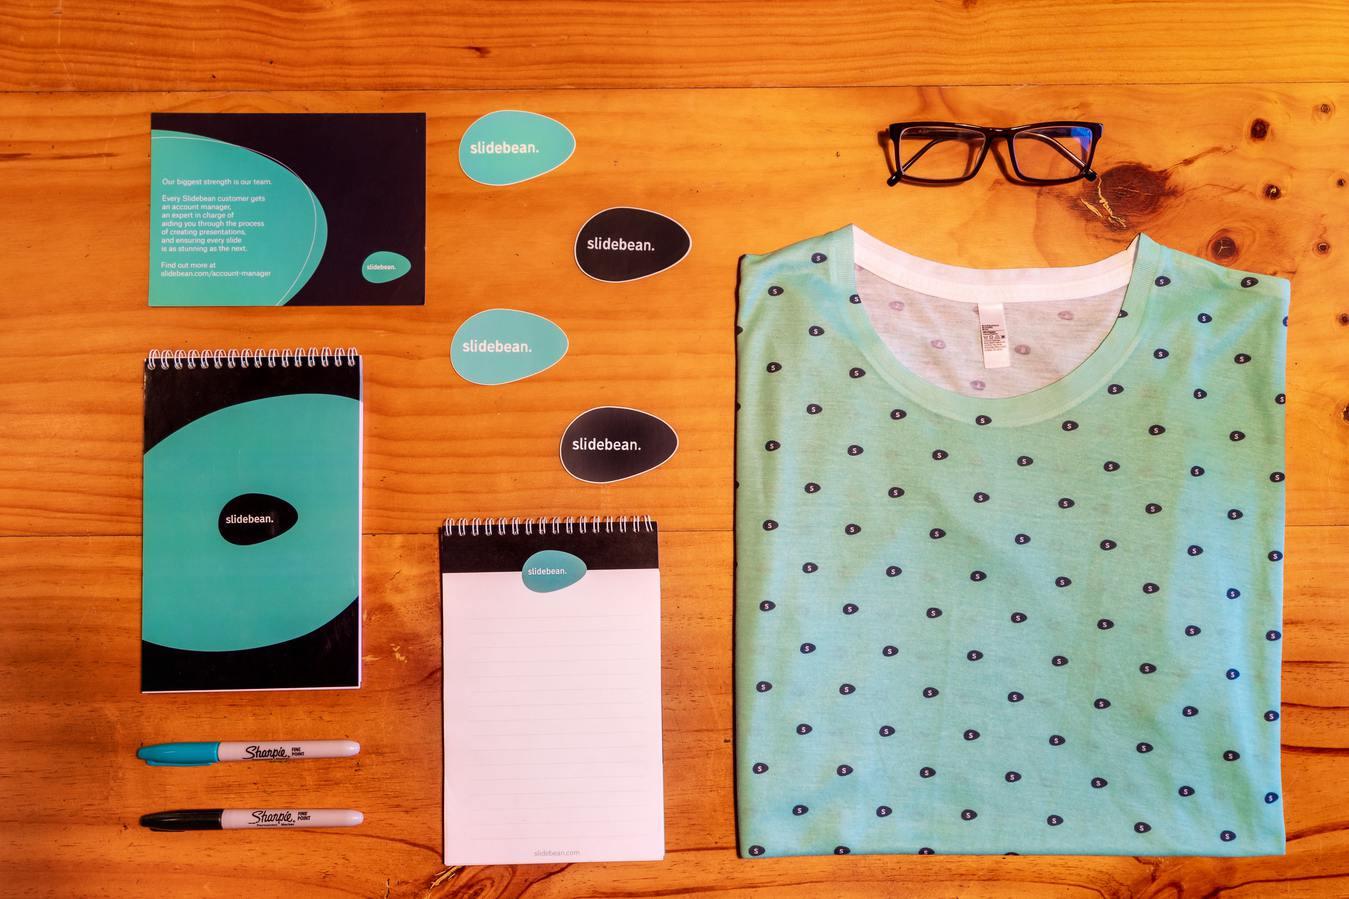 amostras de branding e design sobre a mesa